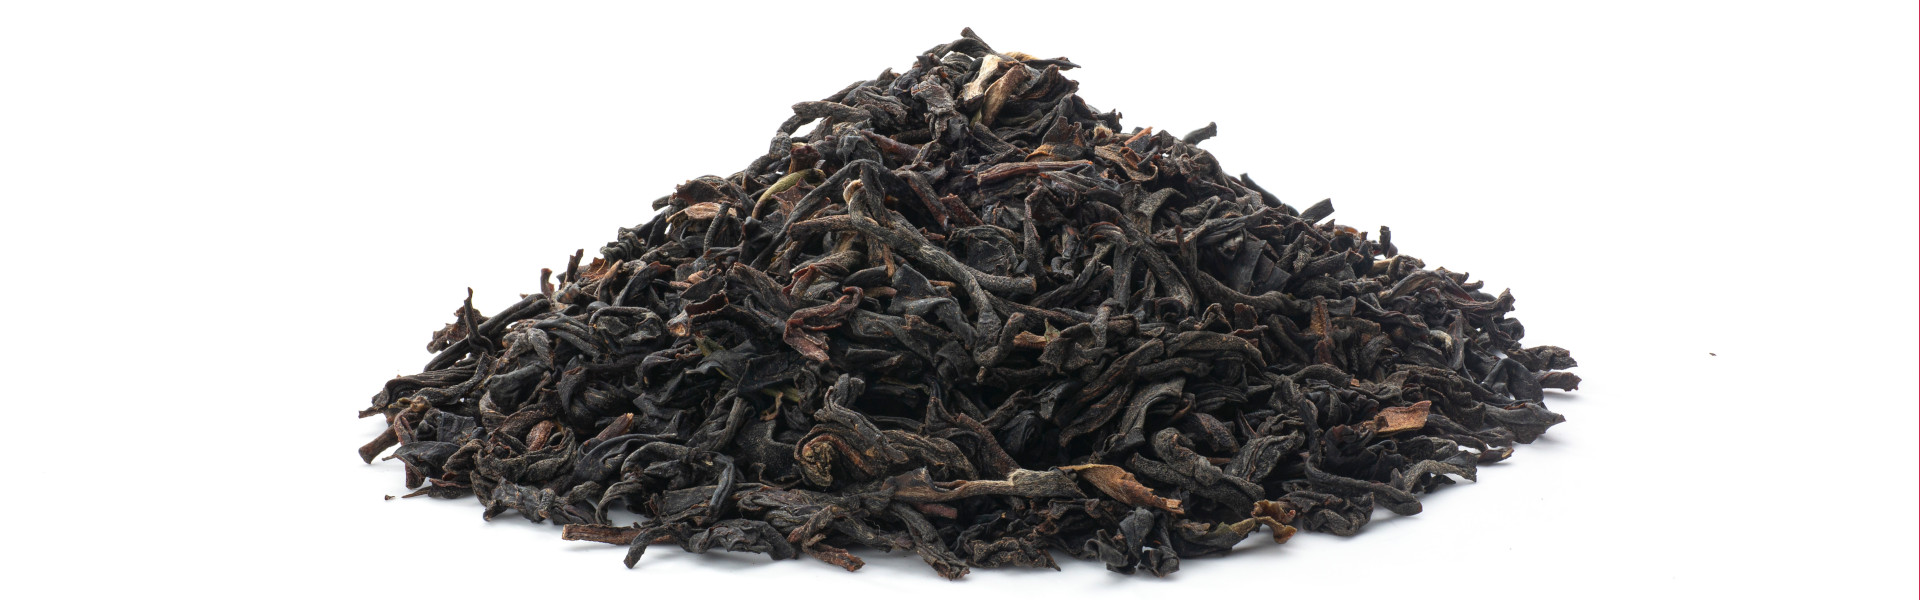 Herbal Republic Ambassador Breakfast Blend Tea